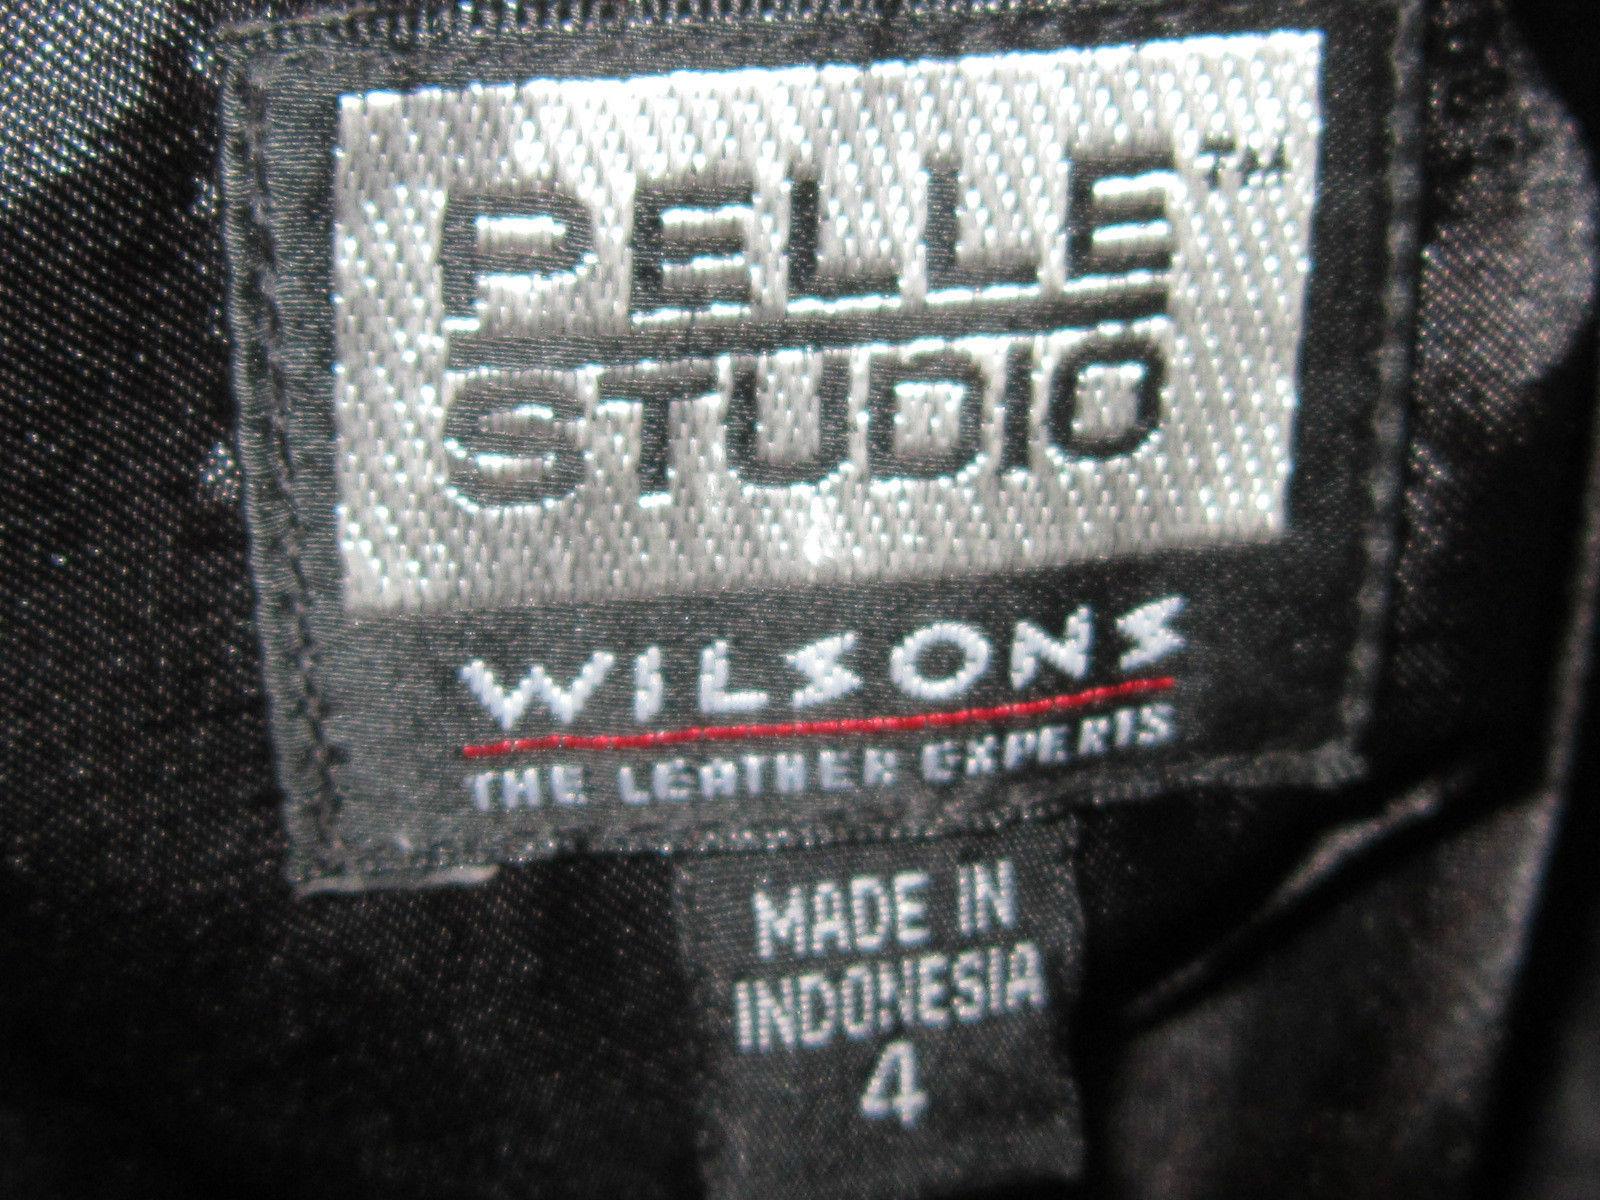 WILSON'S PELLE STUDIO BLACK LEATHER LUXURIOUS BUTTERY SOFT SKIRT SIZE 4